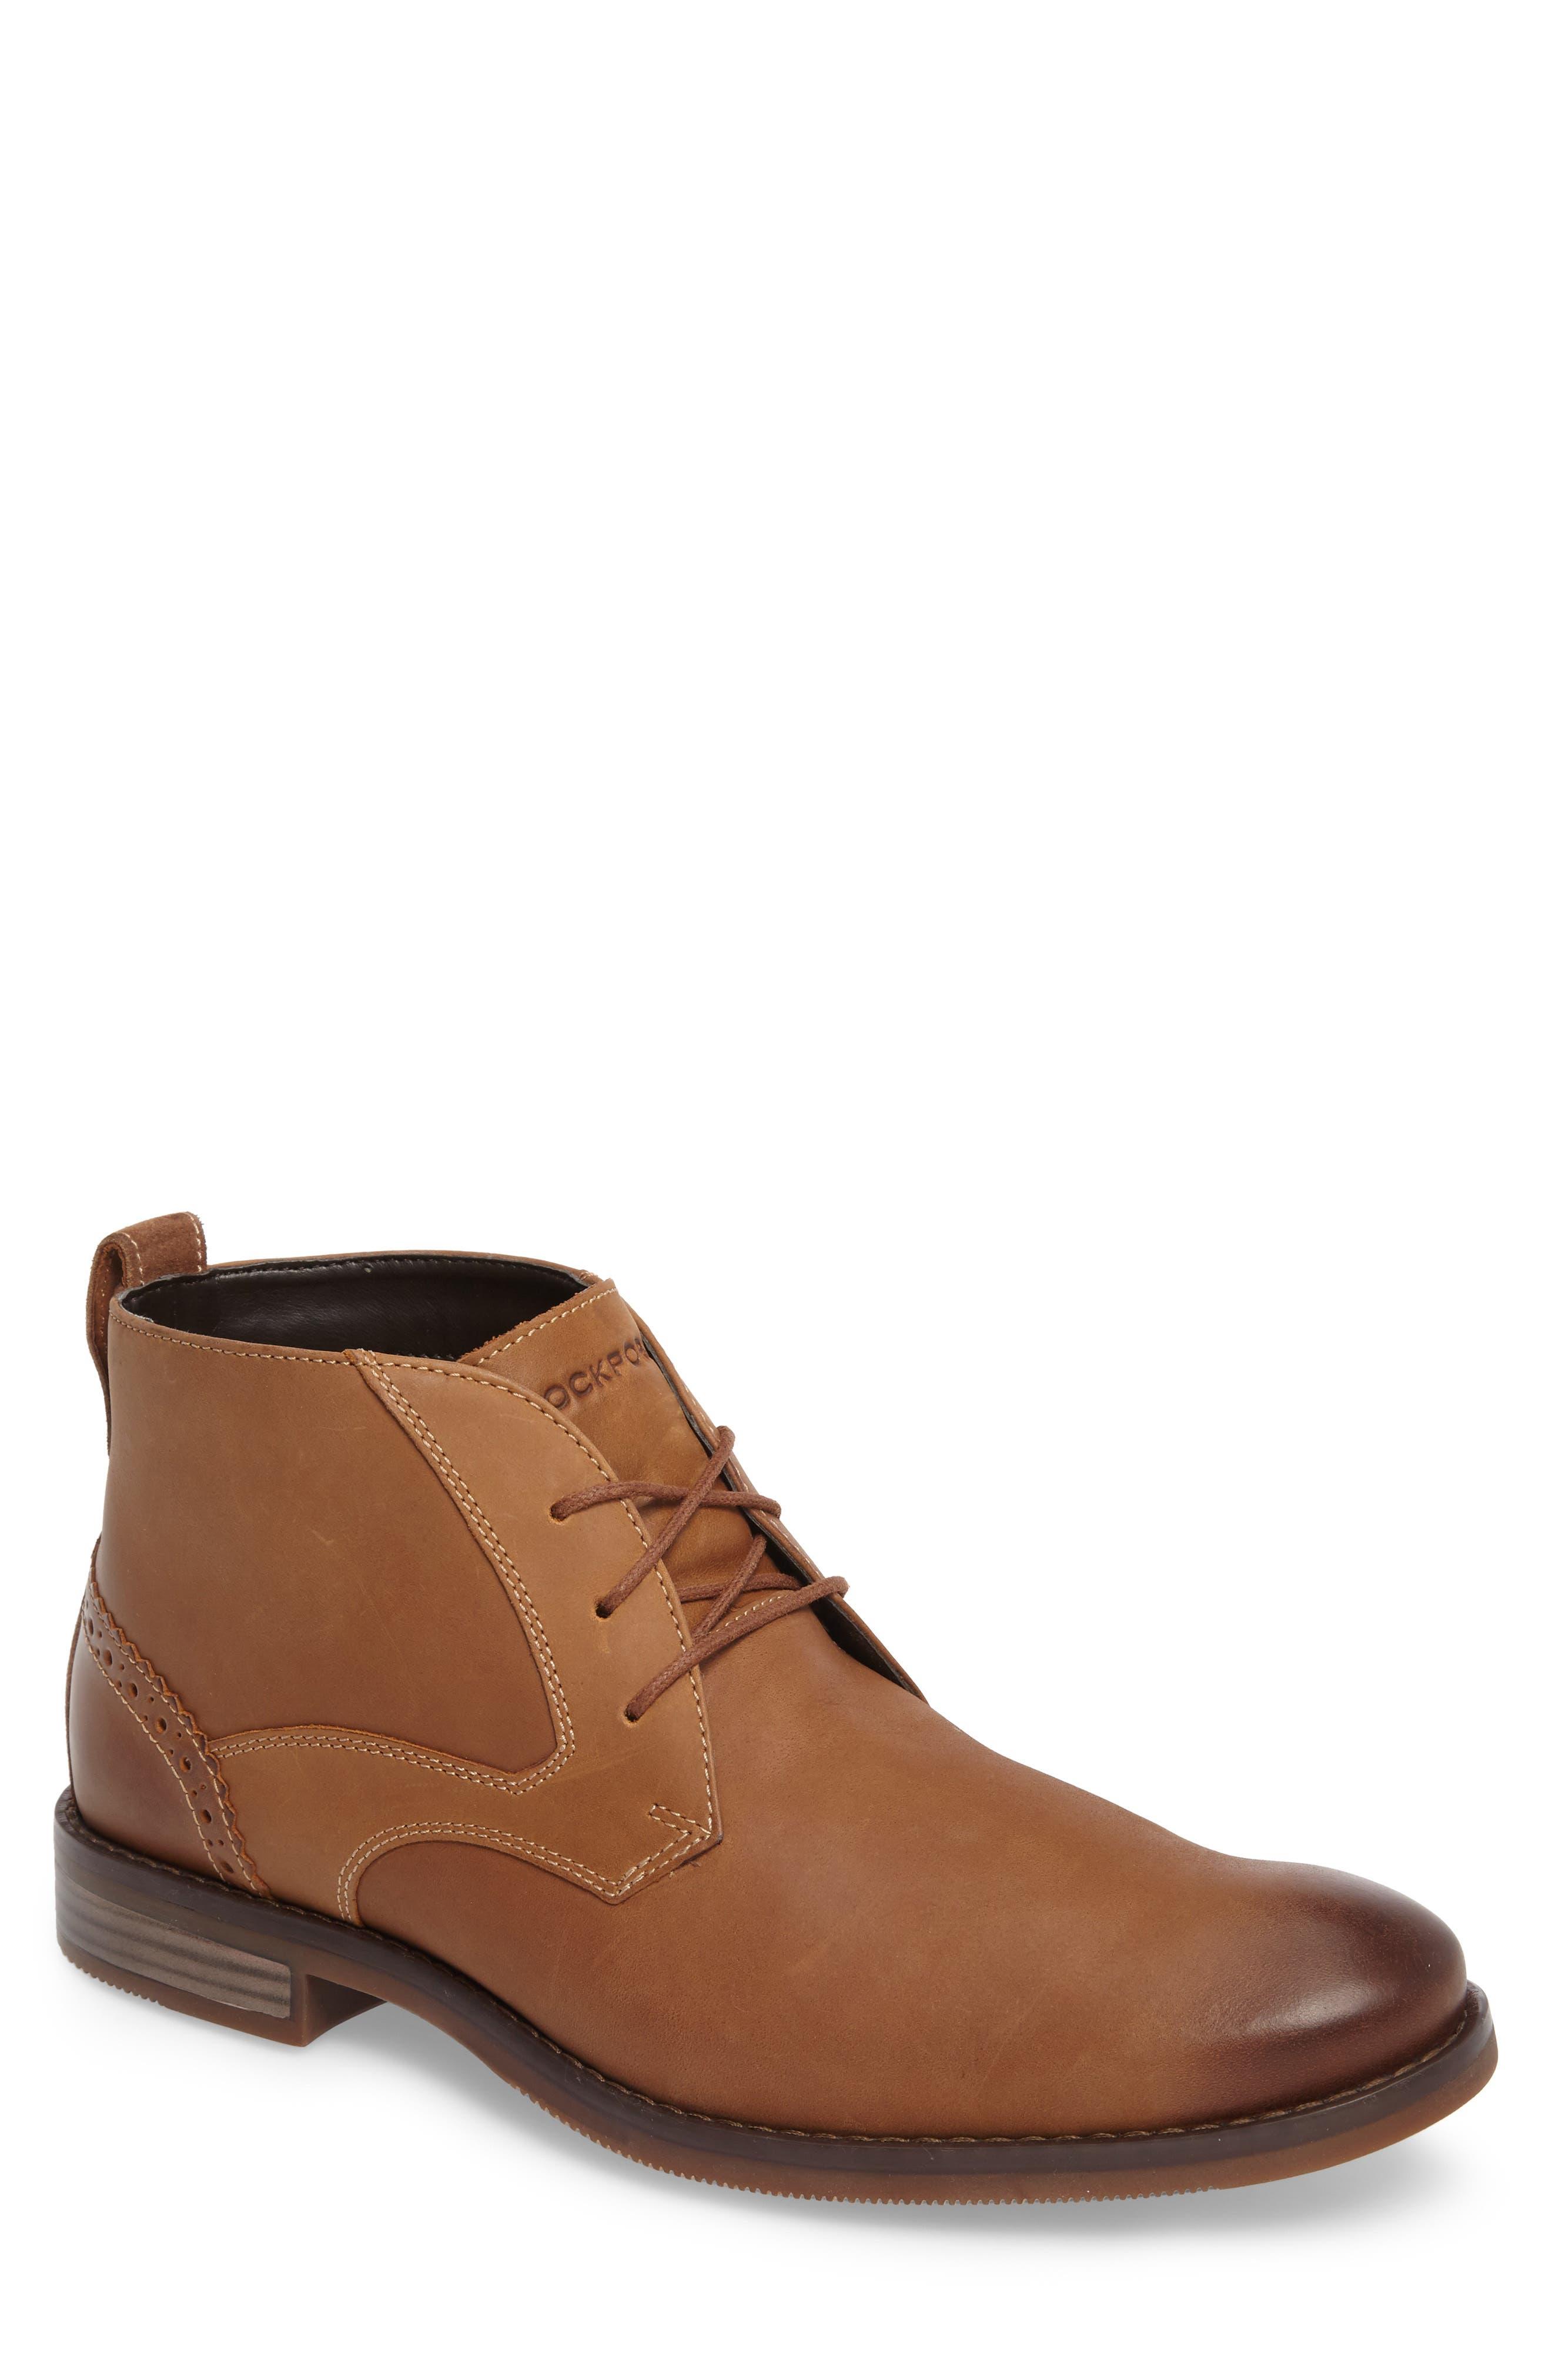 Wynstin Chukka Boot,                         Main,                         color, Tobacco Leather